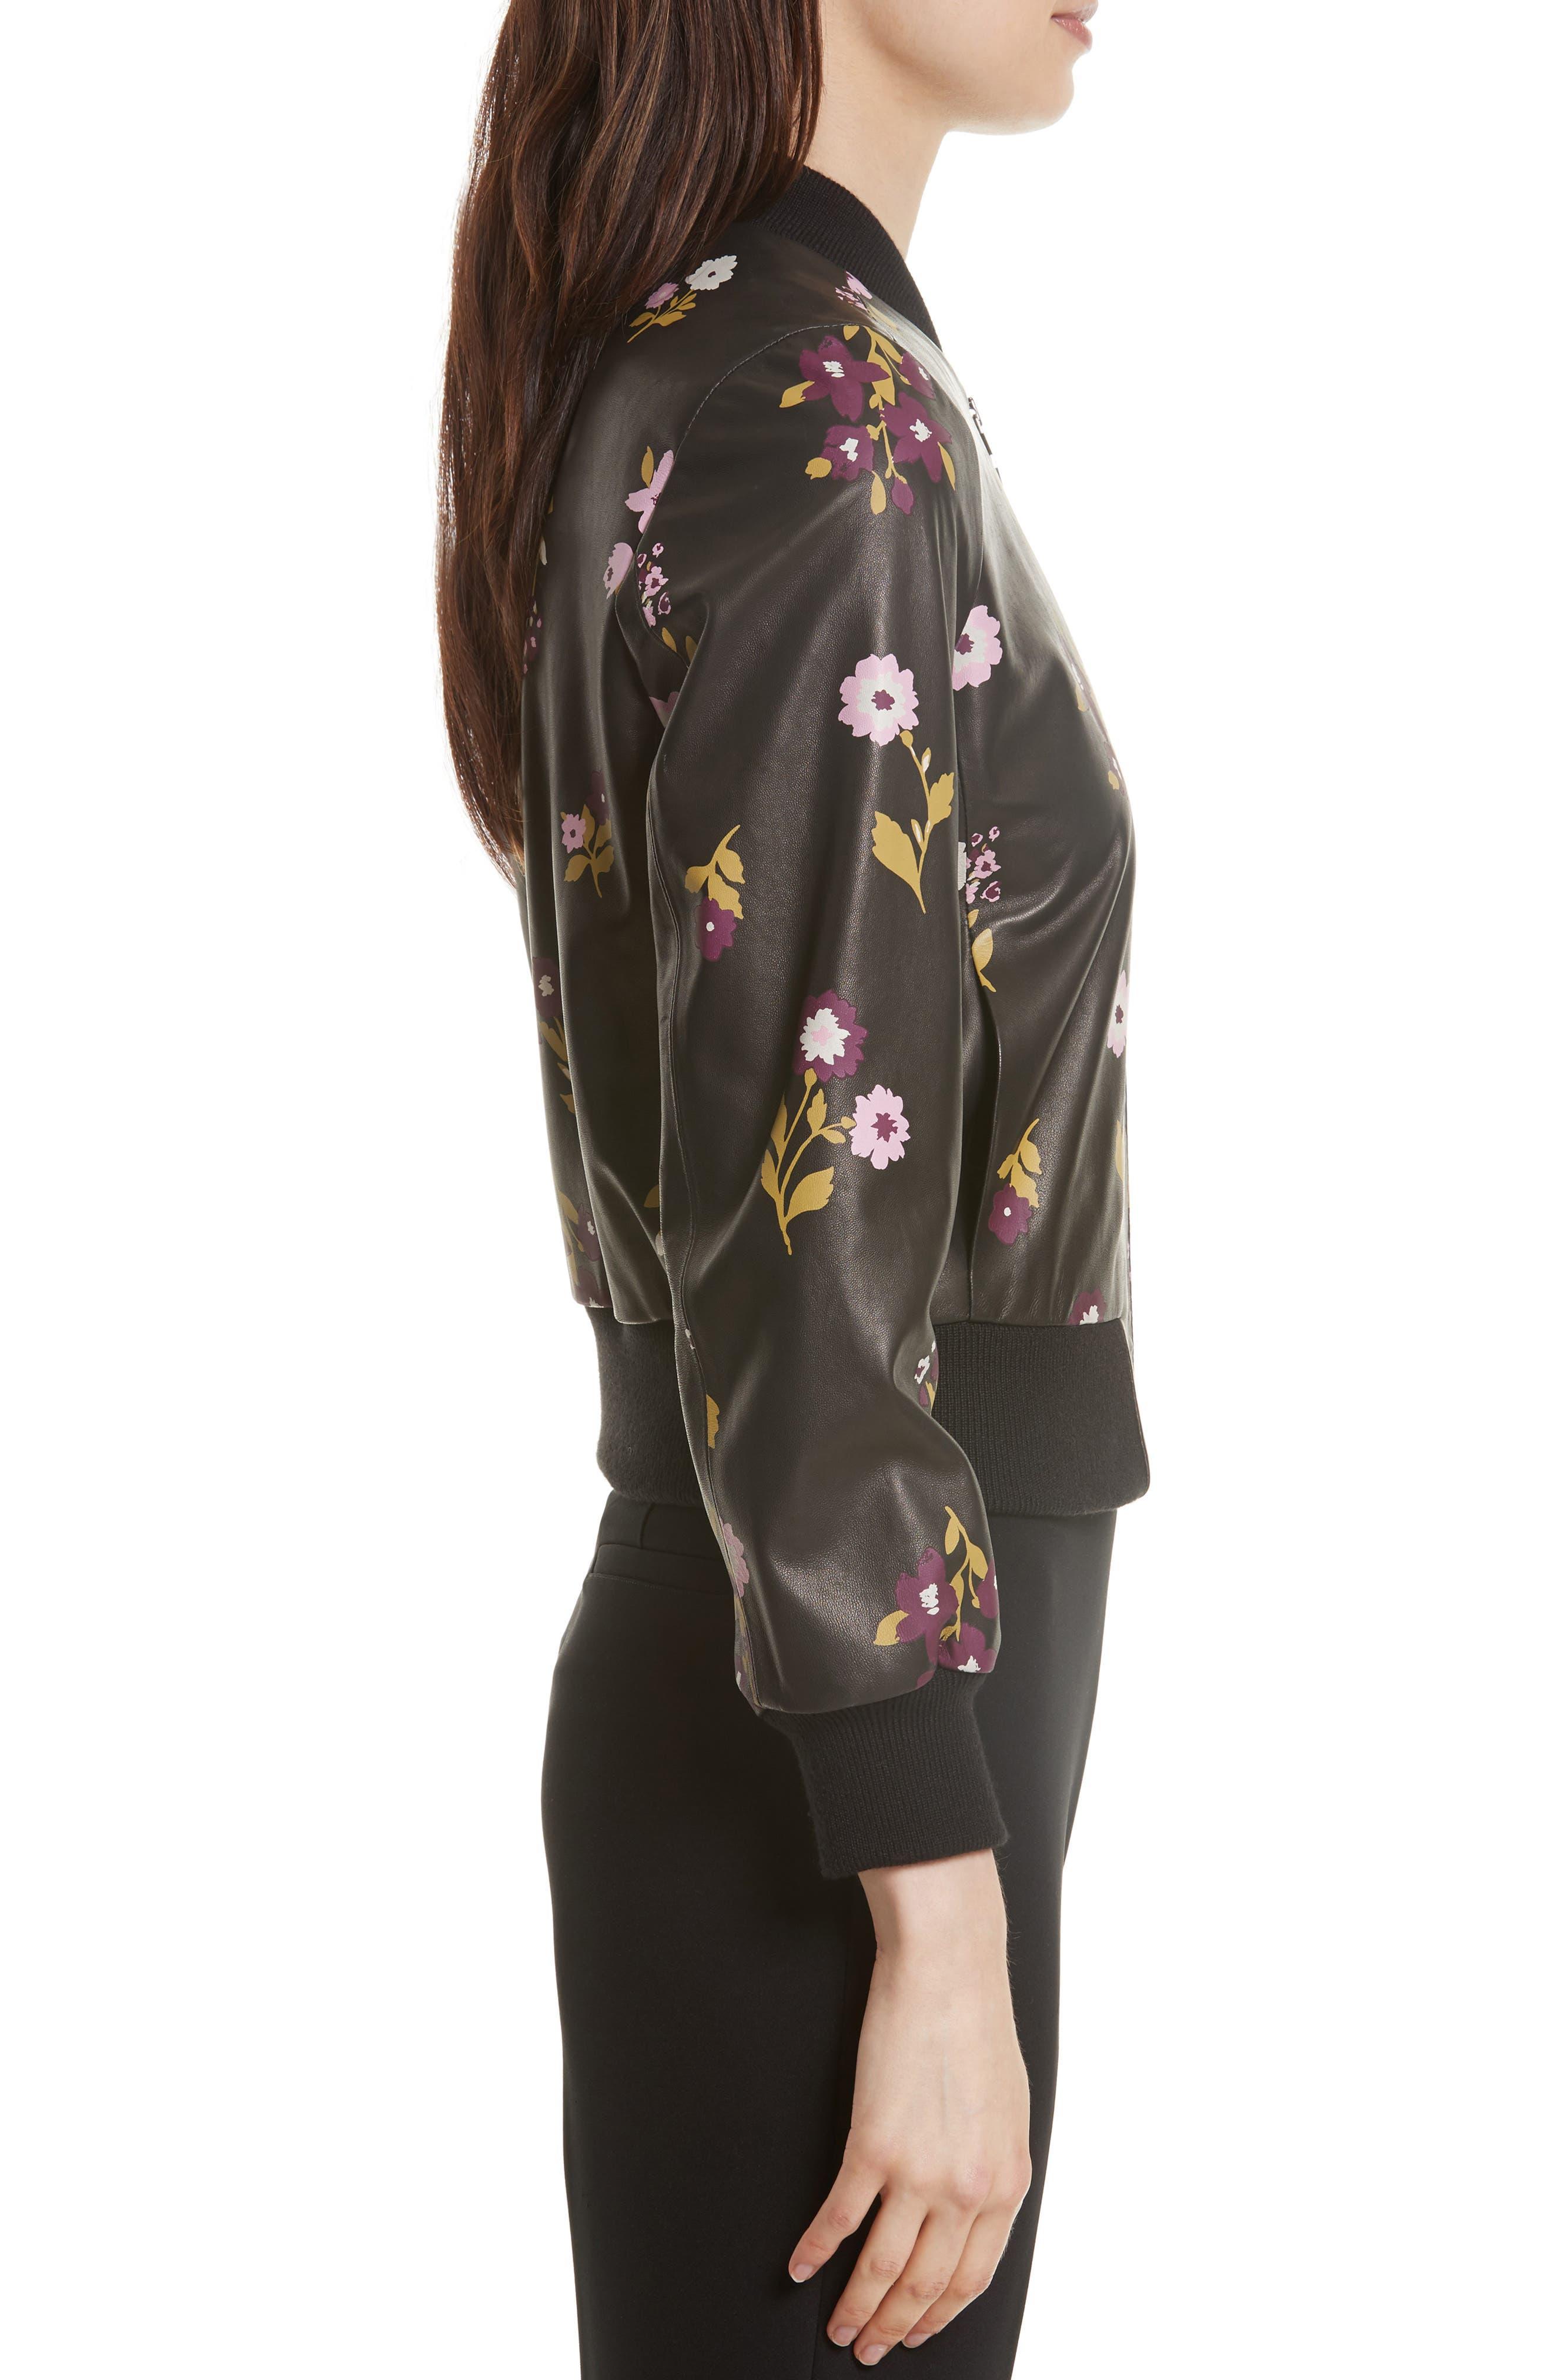 in bloom leather bomber jacket,                             Alternate thumbnail 3, color,                             Black